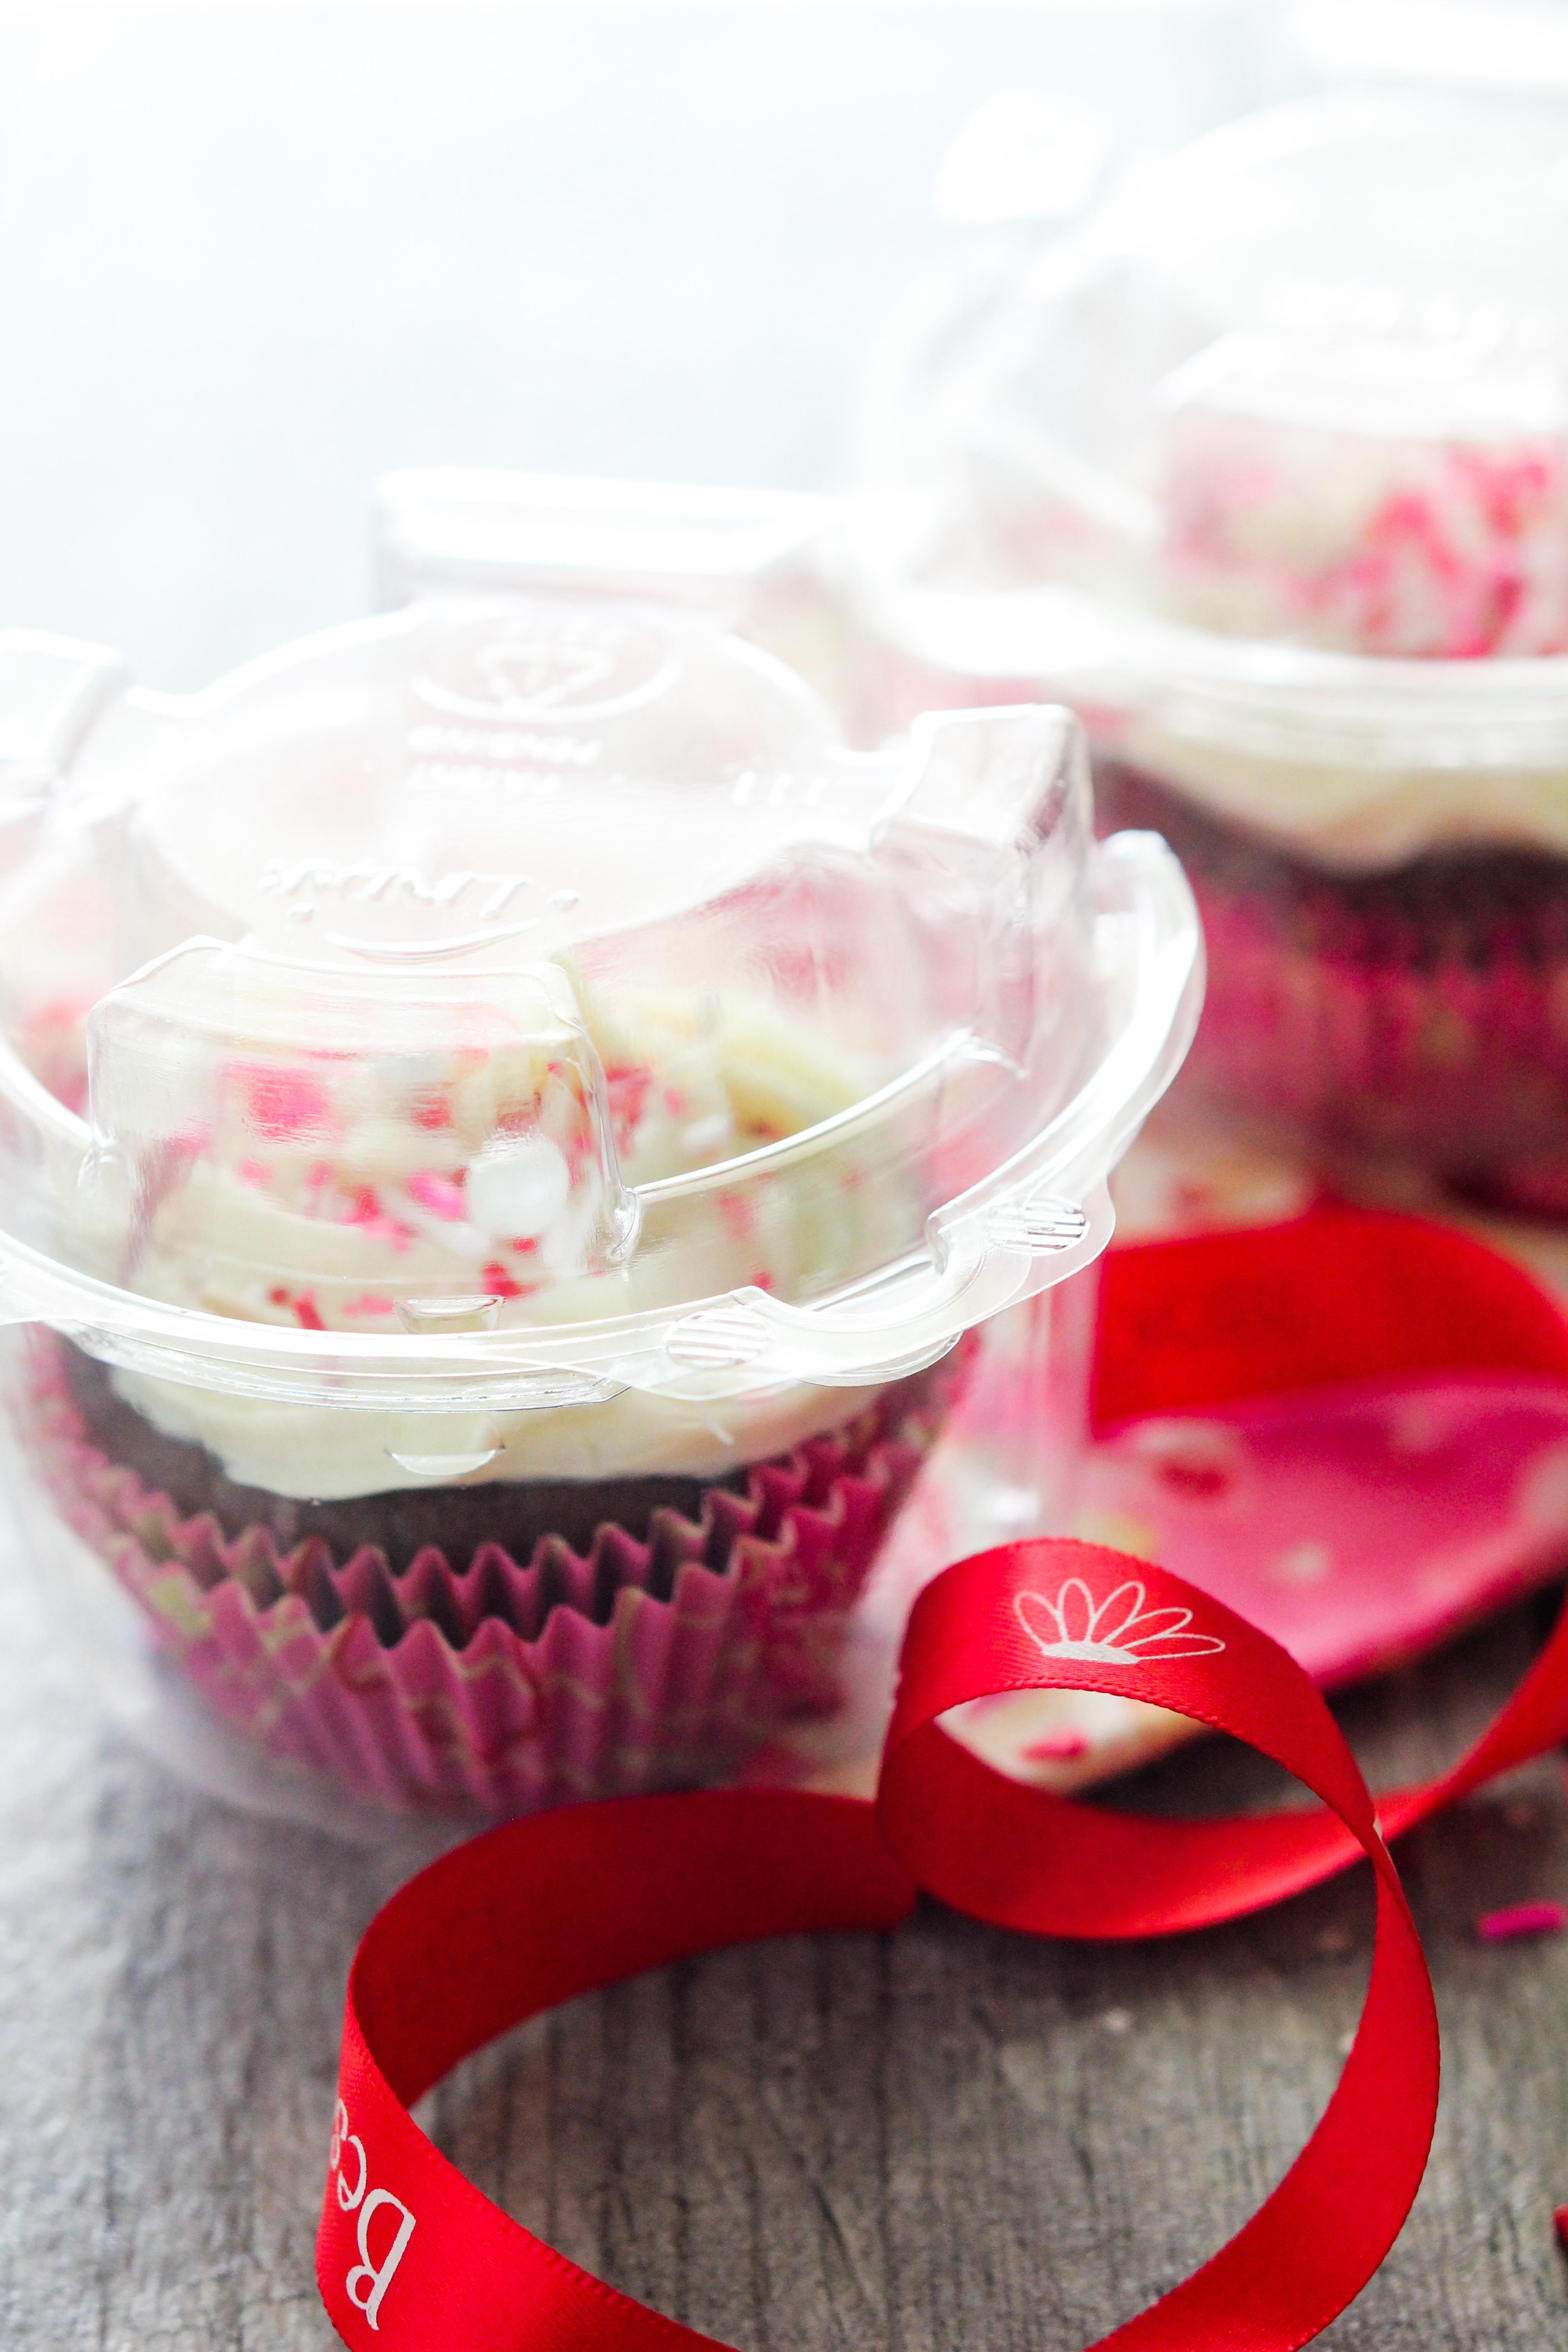 Fudge Filled Chocolate Cupcakes